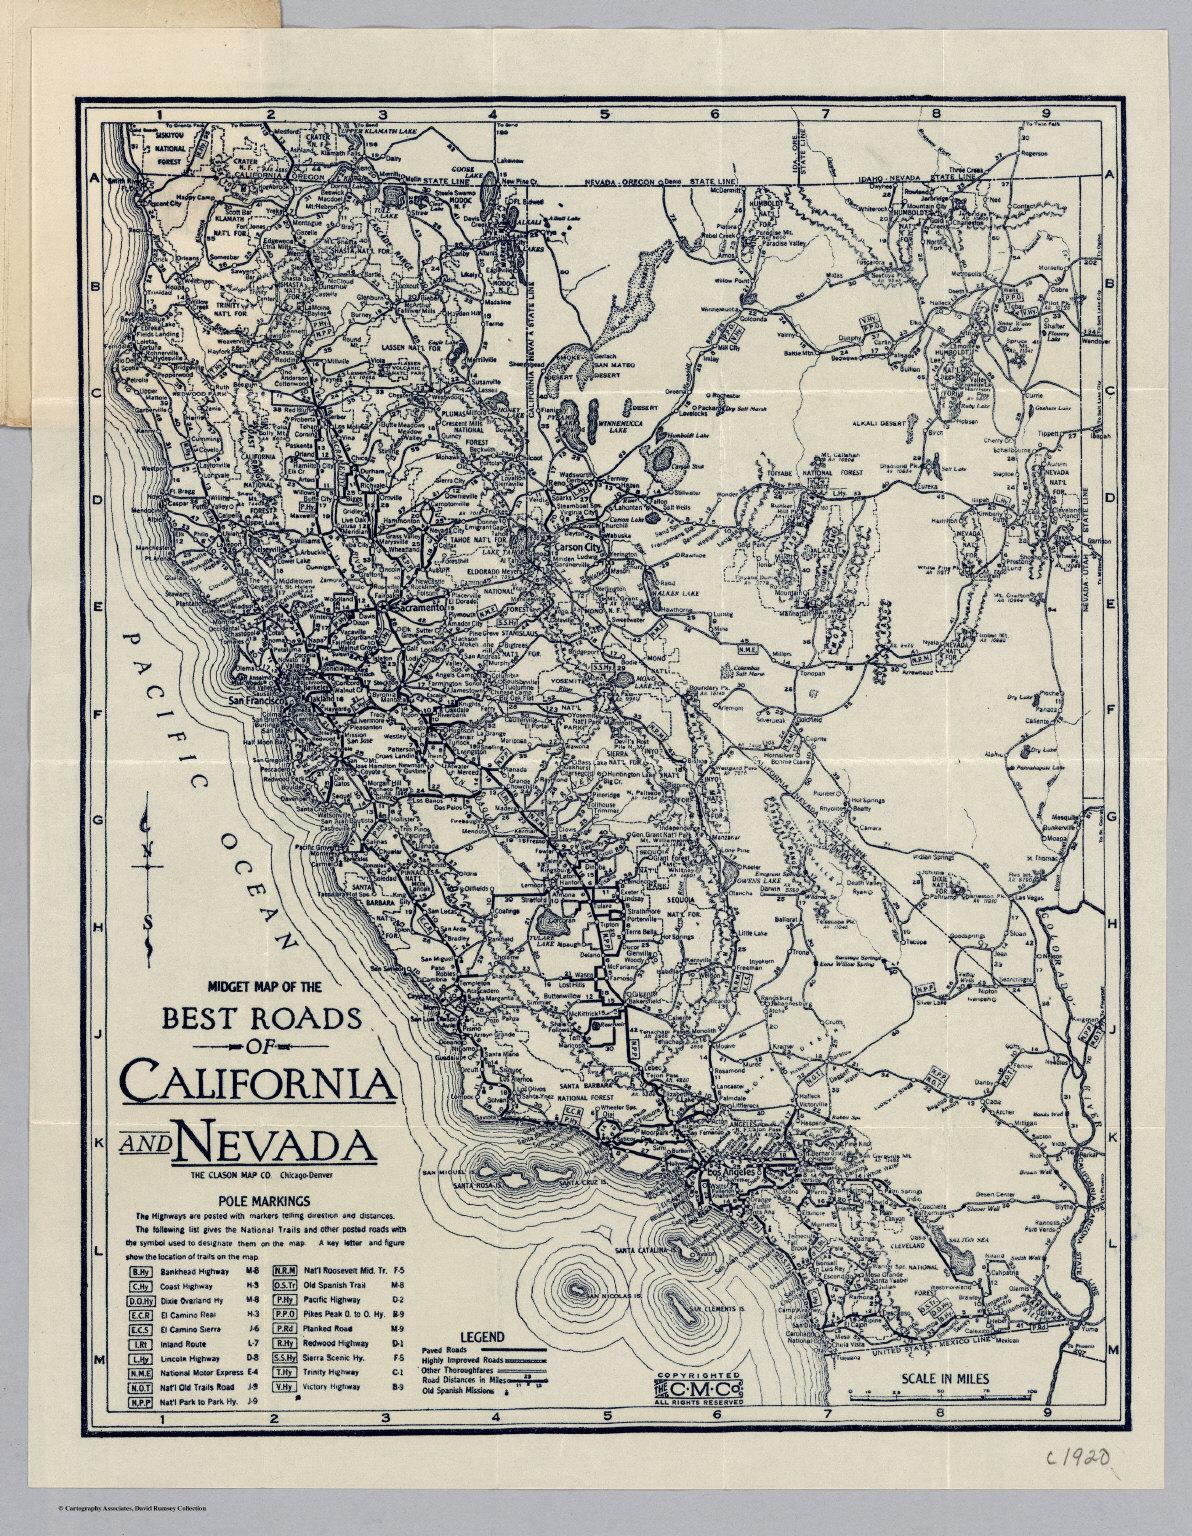 Roads Of California And Nevada.